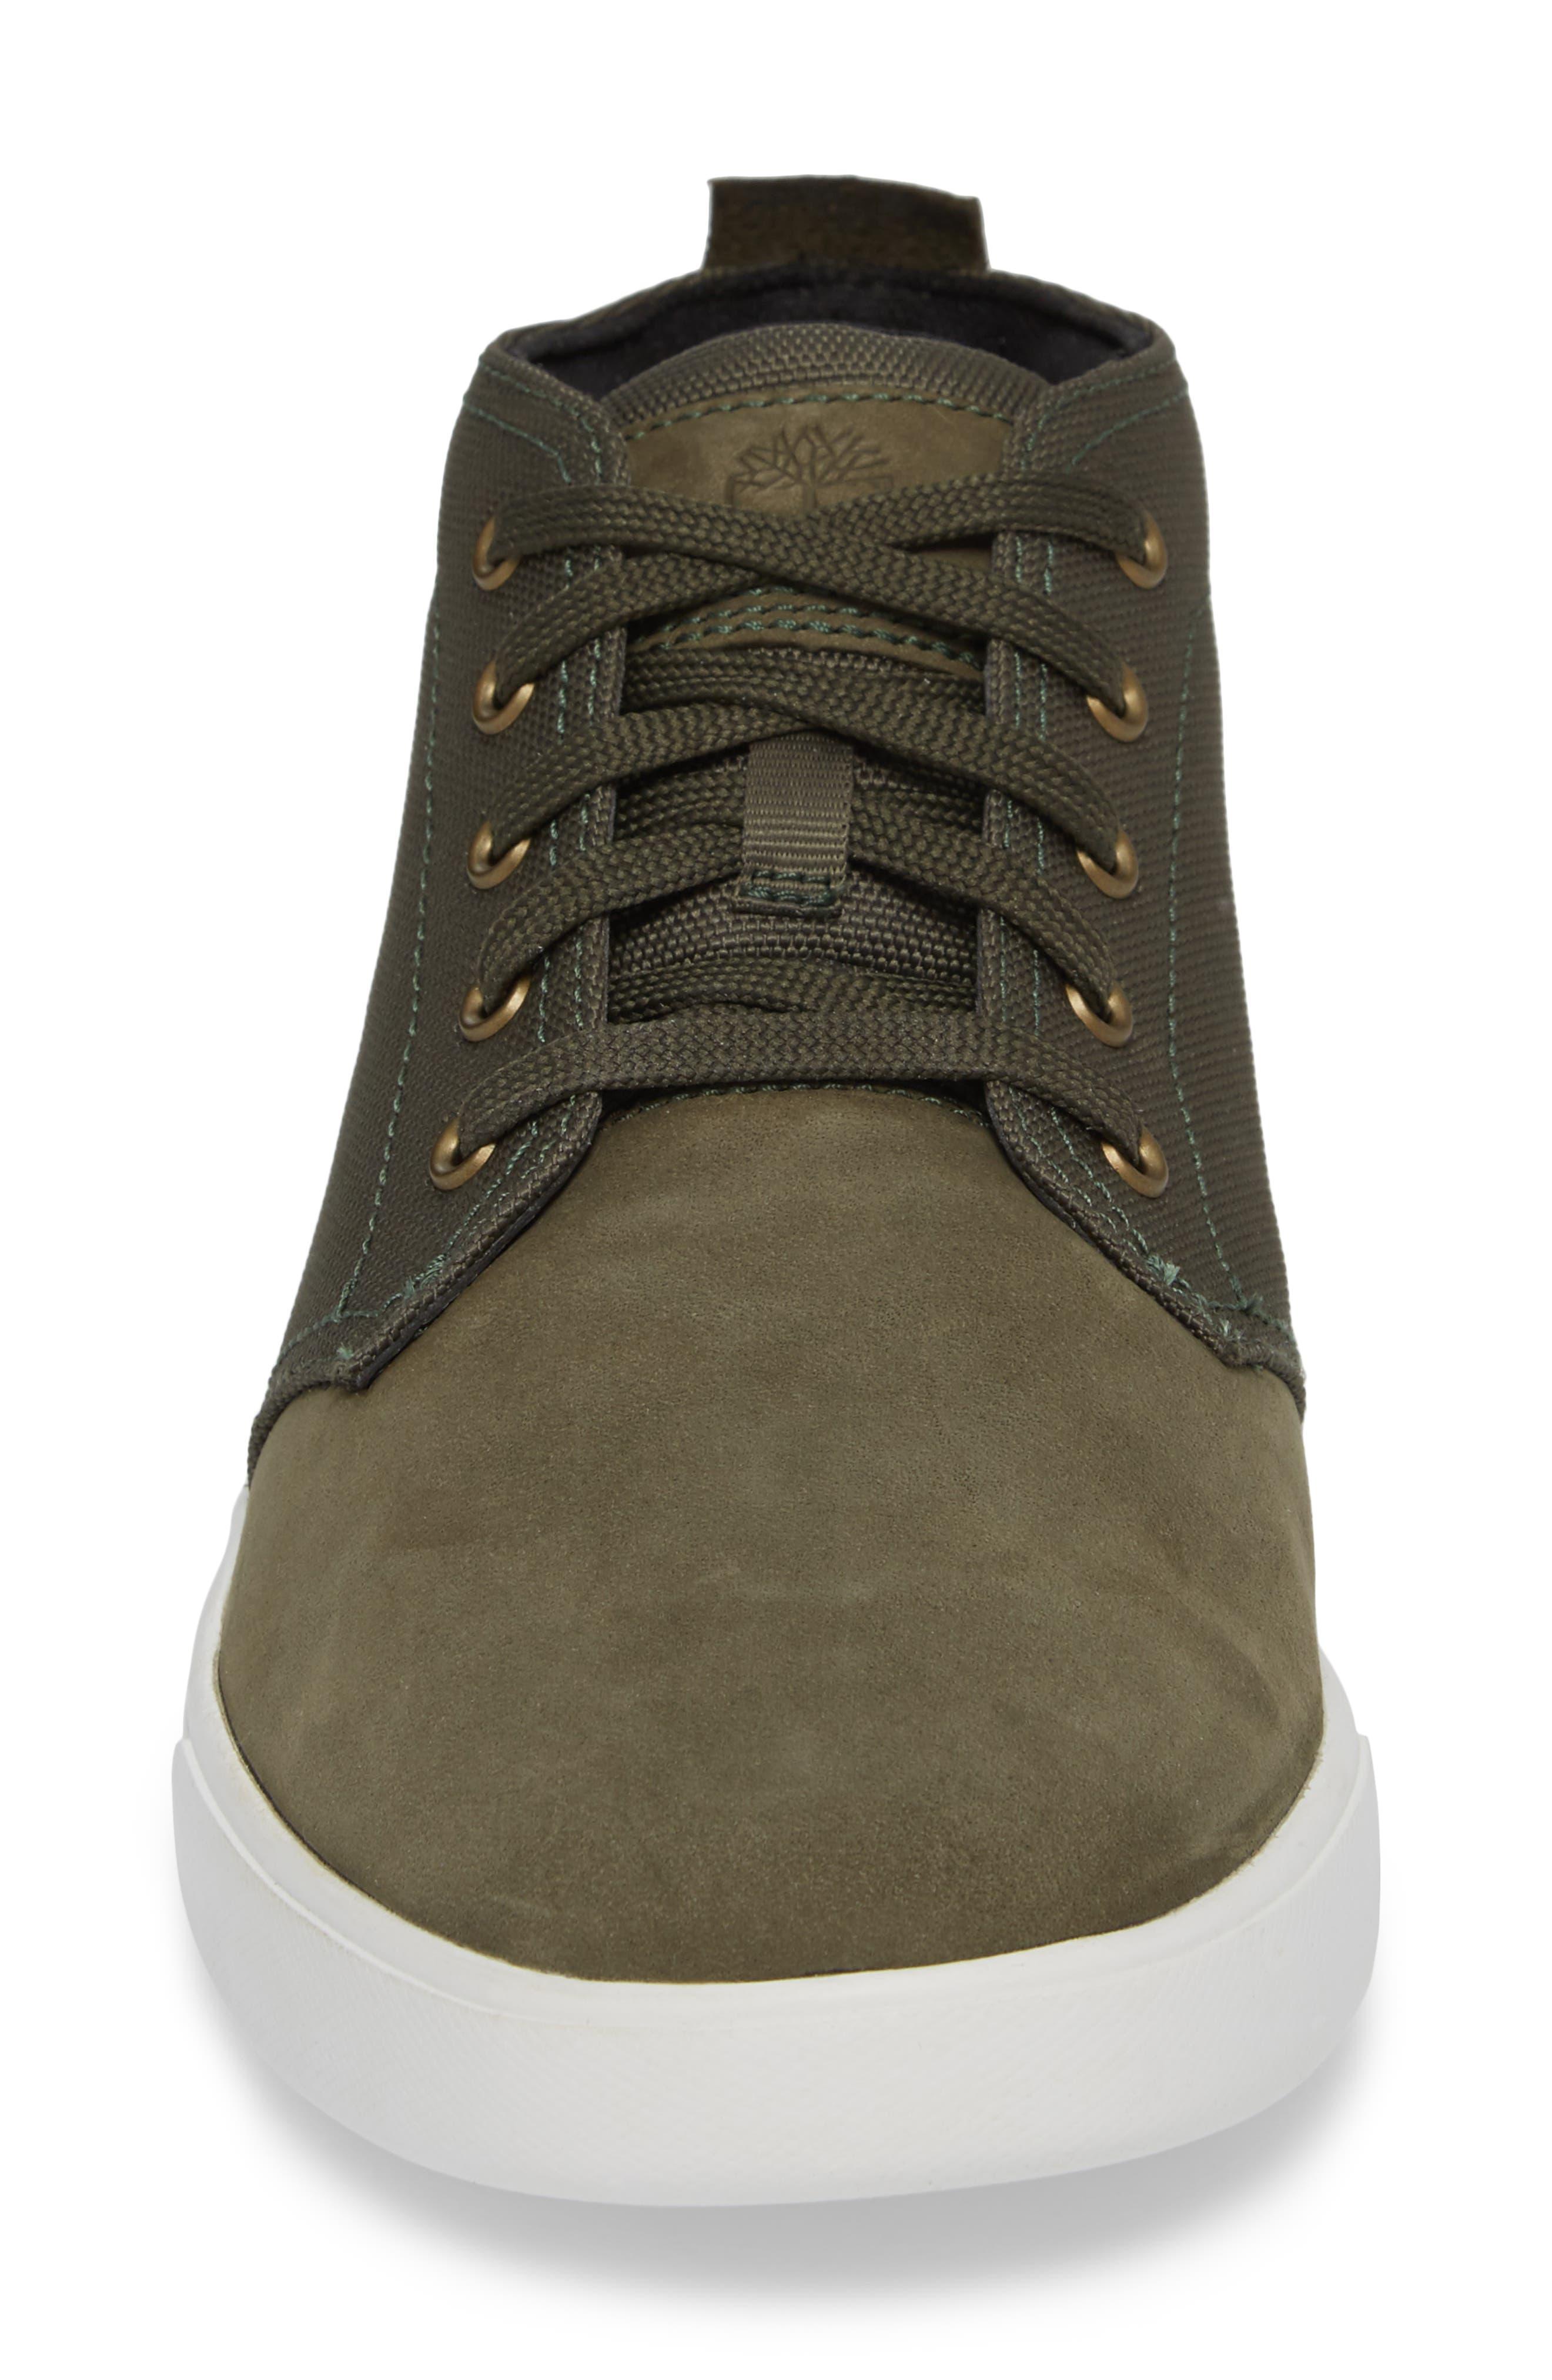 Earthkeepers<sup>®</sup> 'Groveton' Chukka Sneaker,                             Alternate thumbnail 4, color,                             Grape Leaf Leather